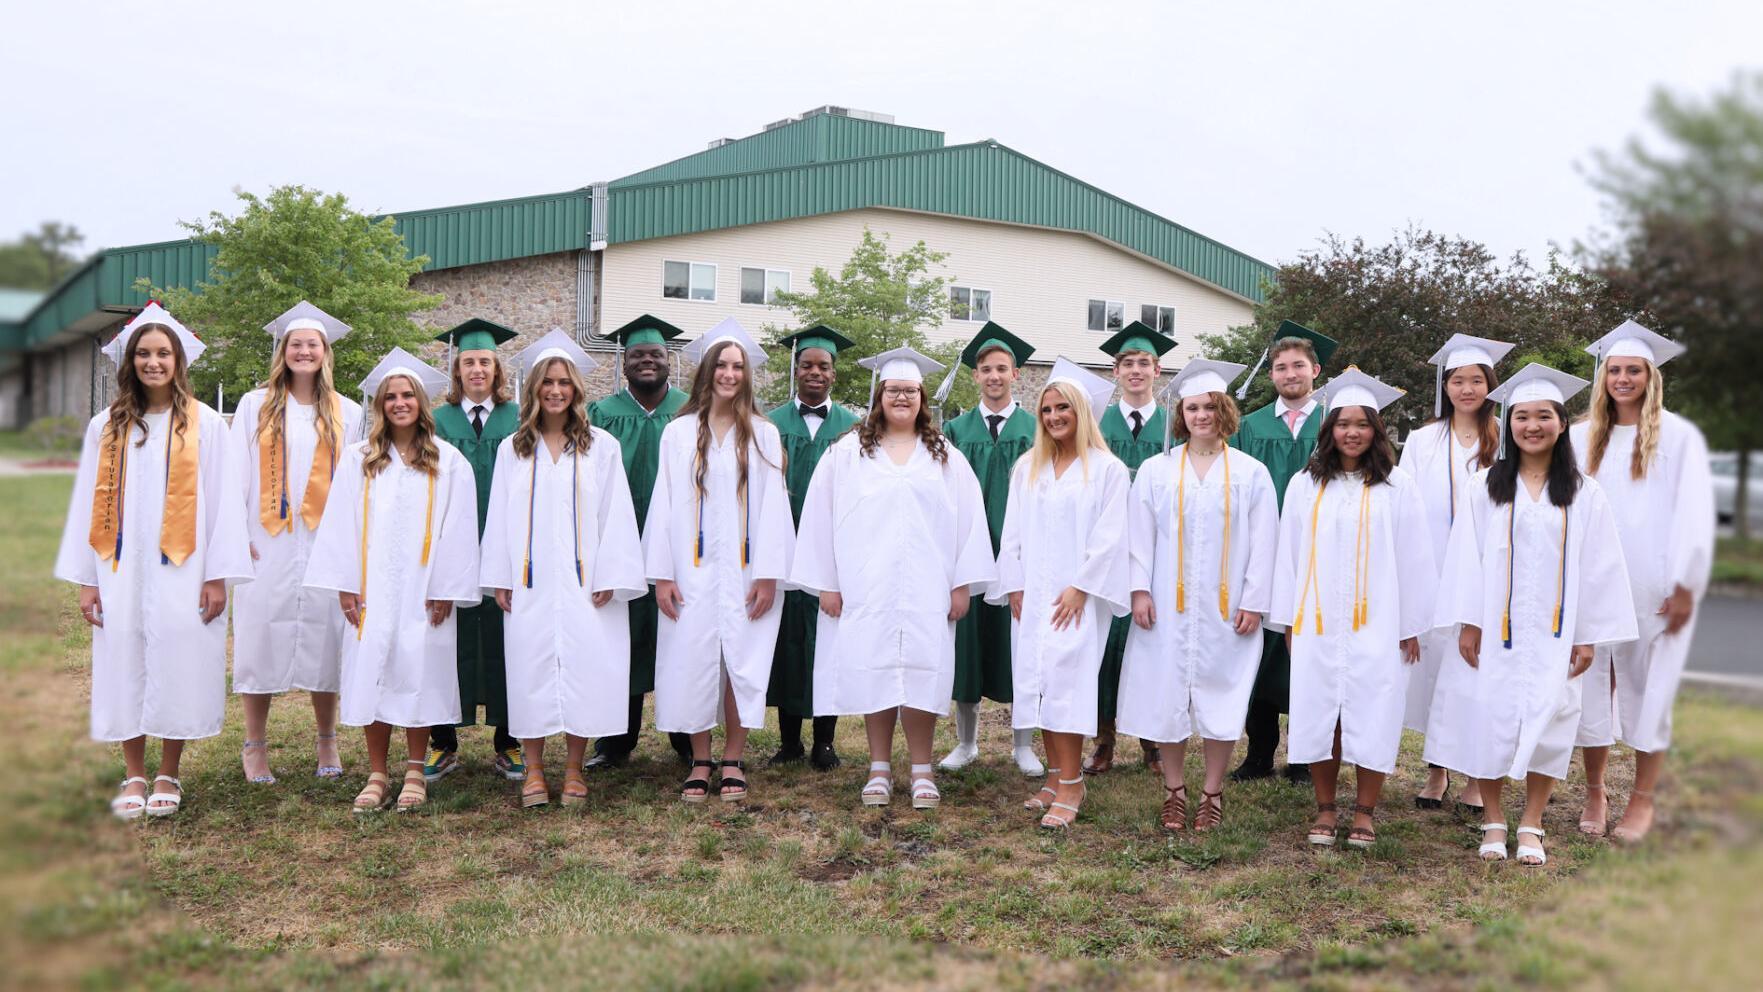 Atlantic Christian School class of 2021 graduates